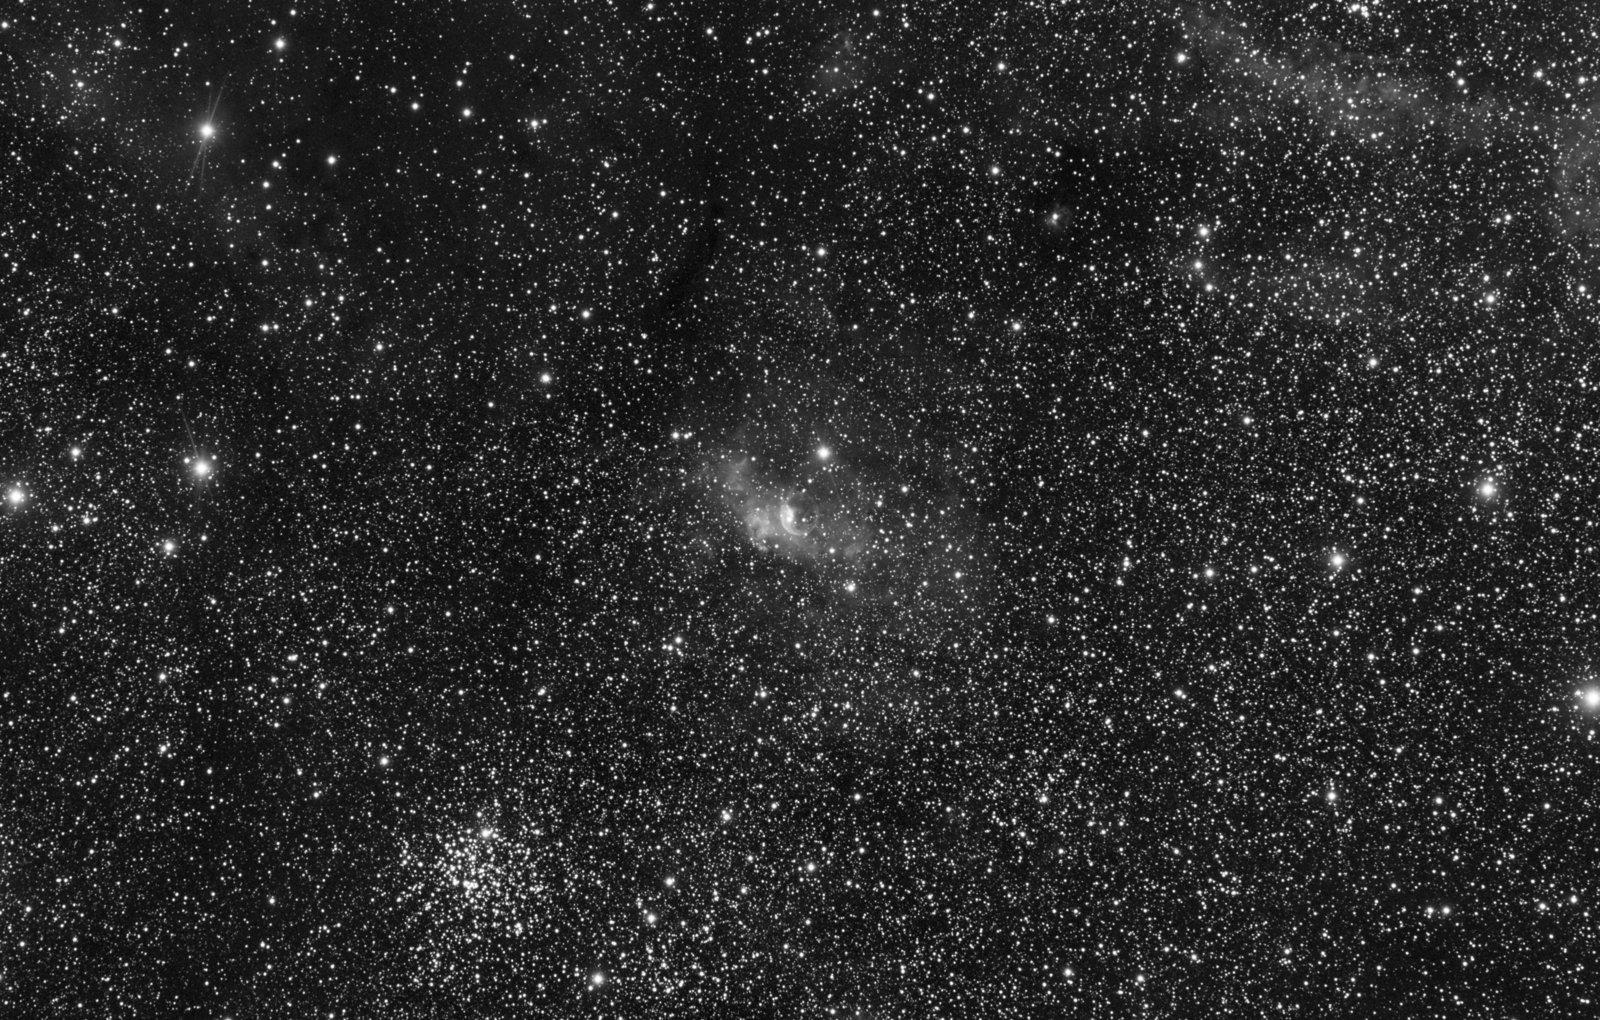 59fde51f49357_NGC7635jcrop1x1.thumb.jpg.279a3bb4653f67d756508563ffc68fef.jpg